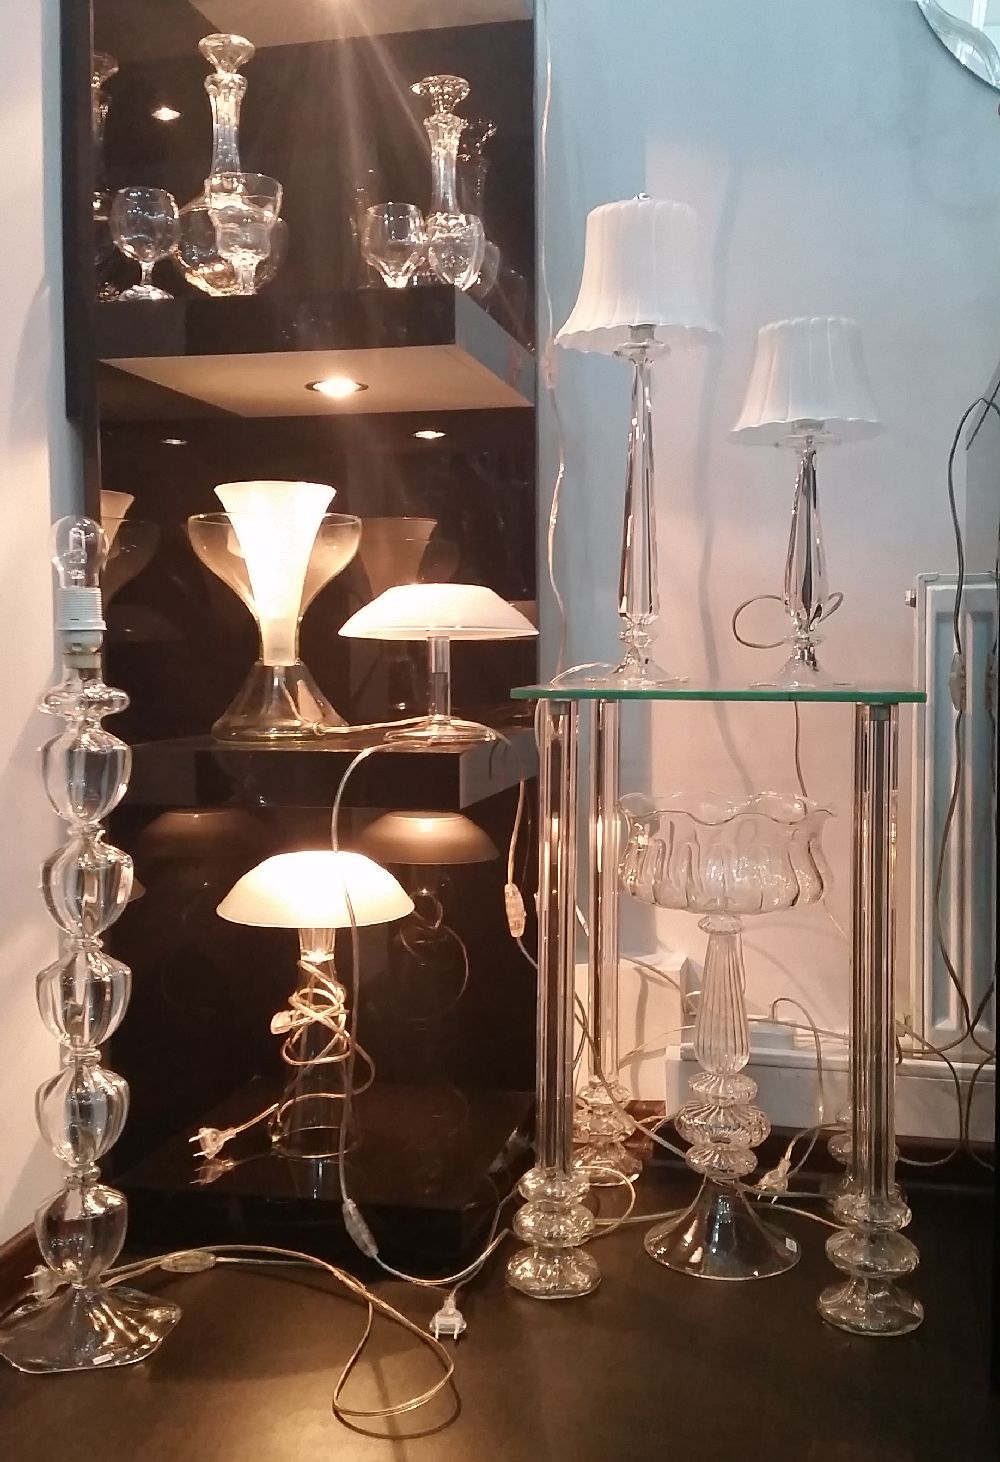 adelaparvu.com despre atelierul de sticlarie Gabriela Seres (60)